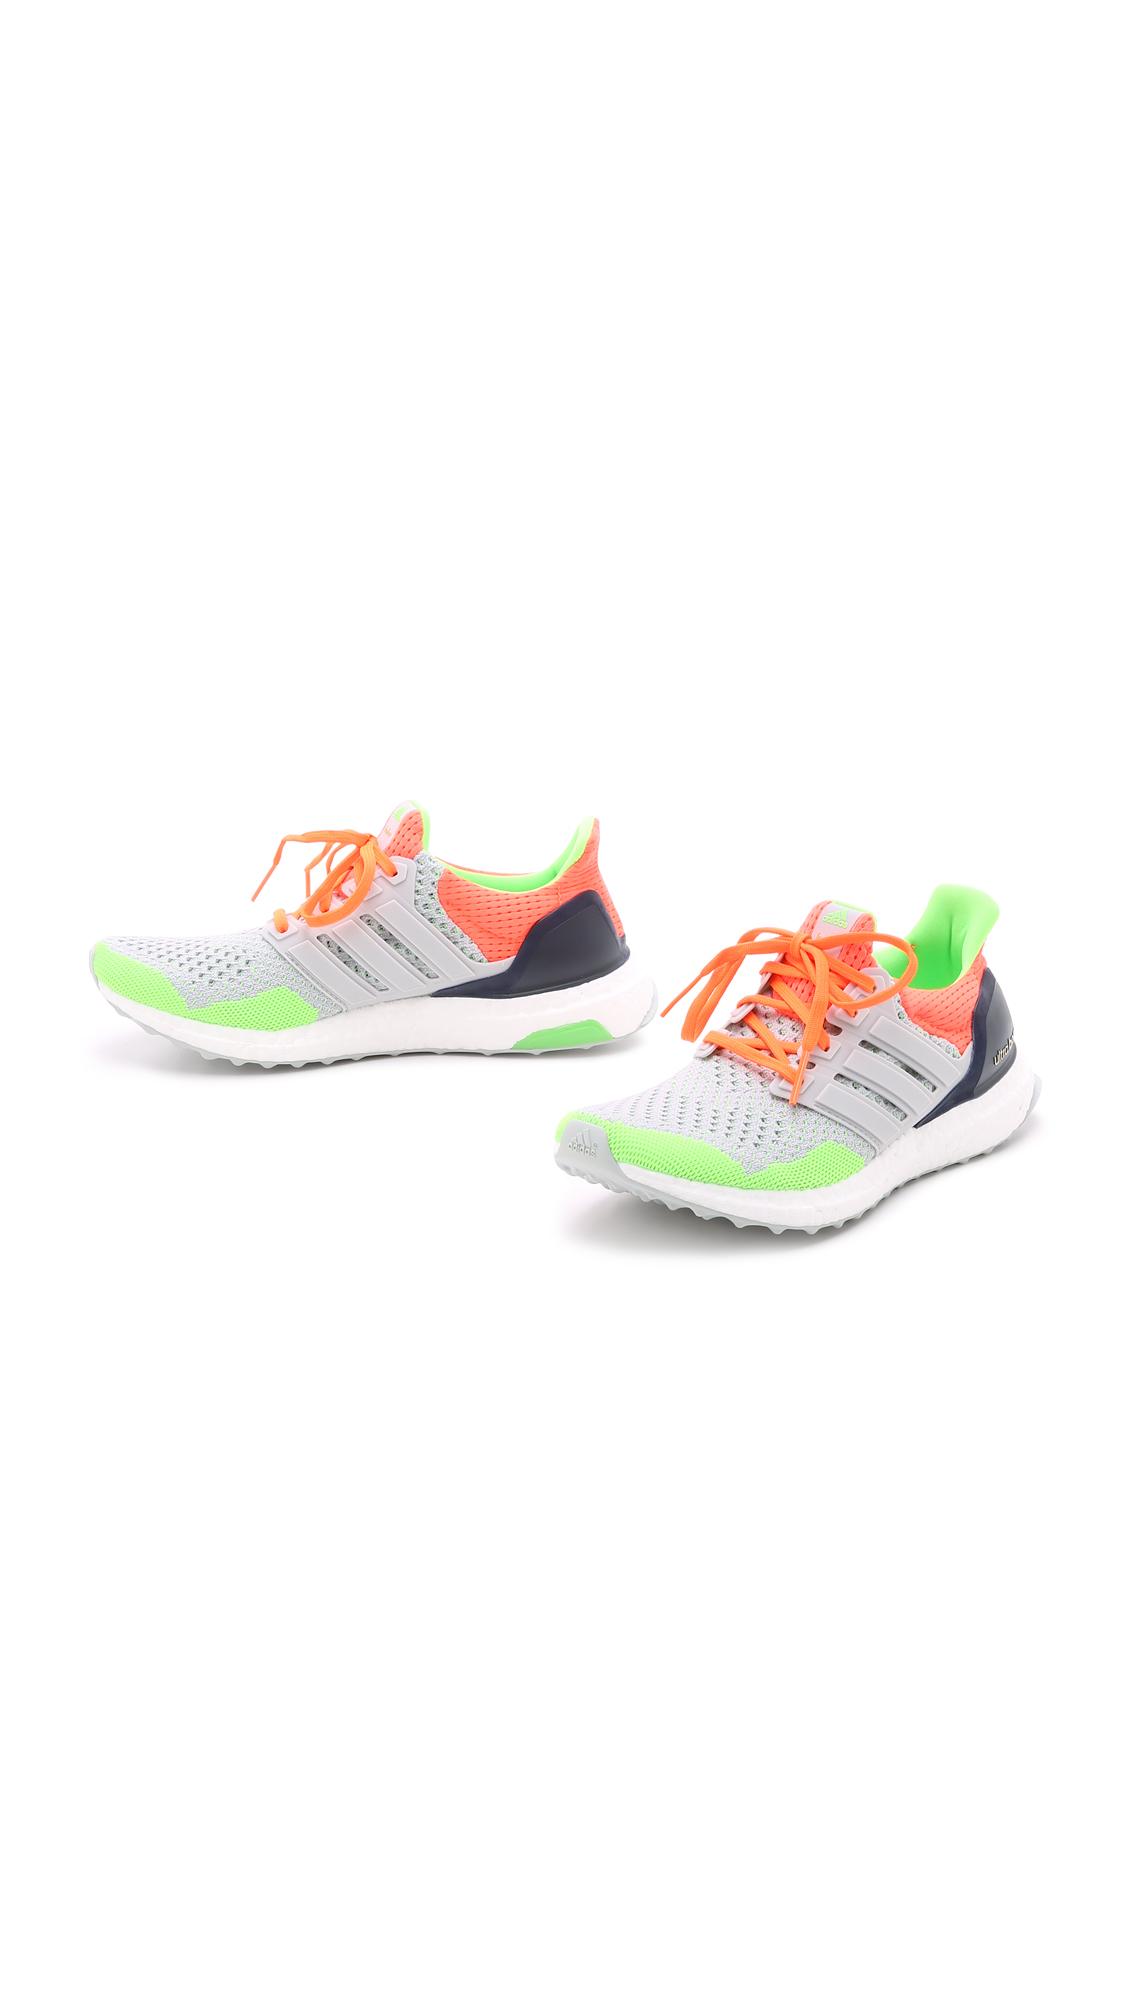 a7ea3c07c Lyst - adidas Ultra Boost Kolor Sneakers - Light Grey solar Orange ...